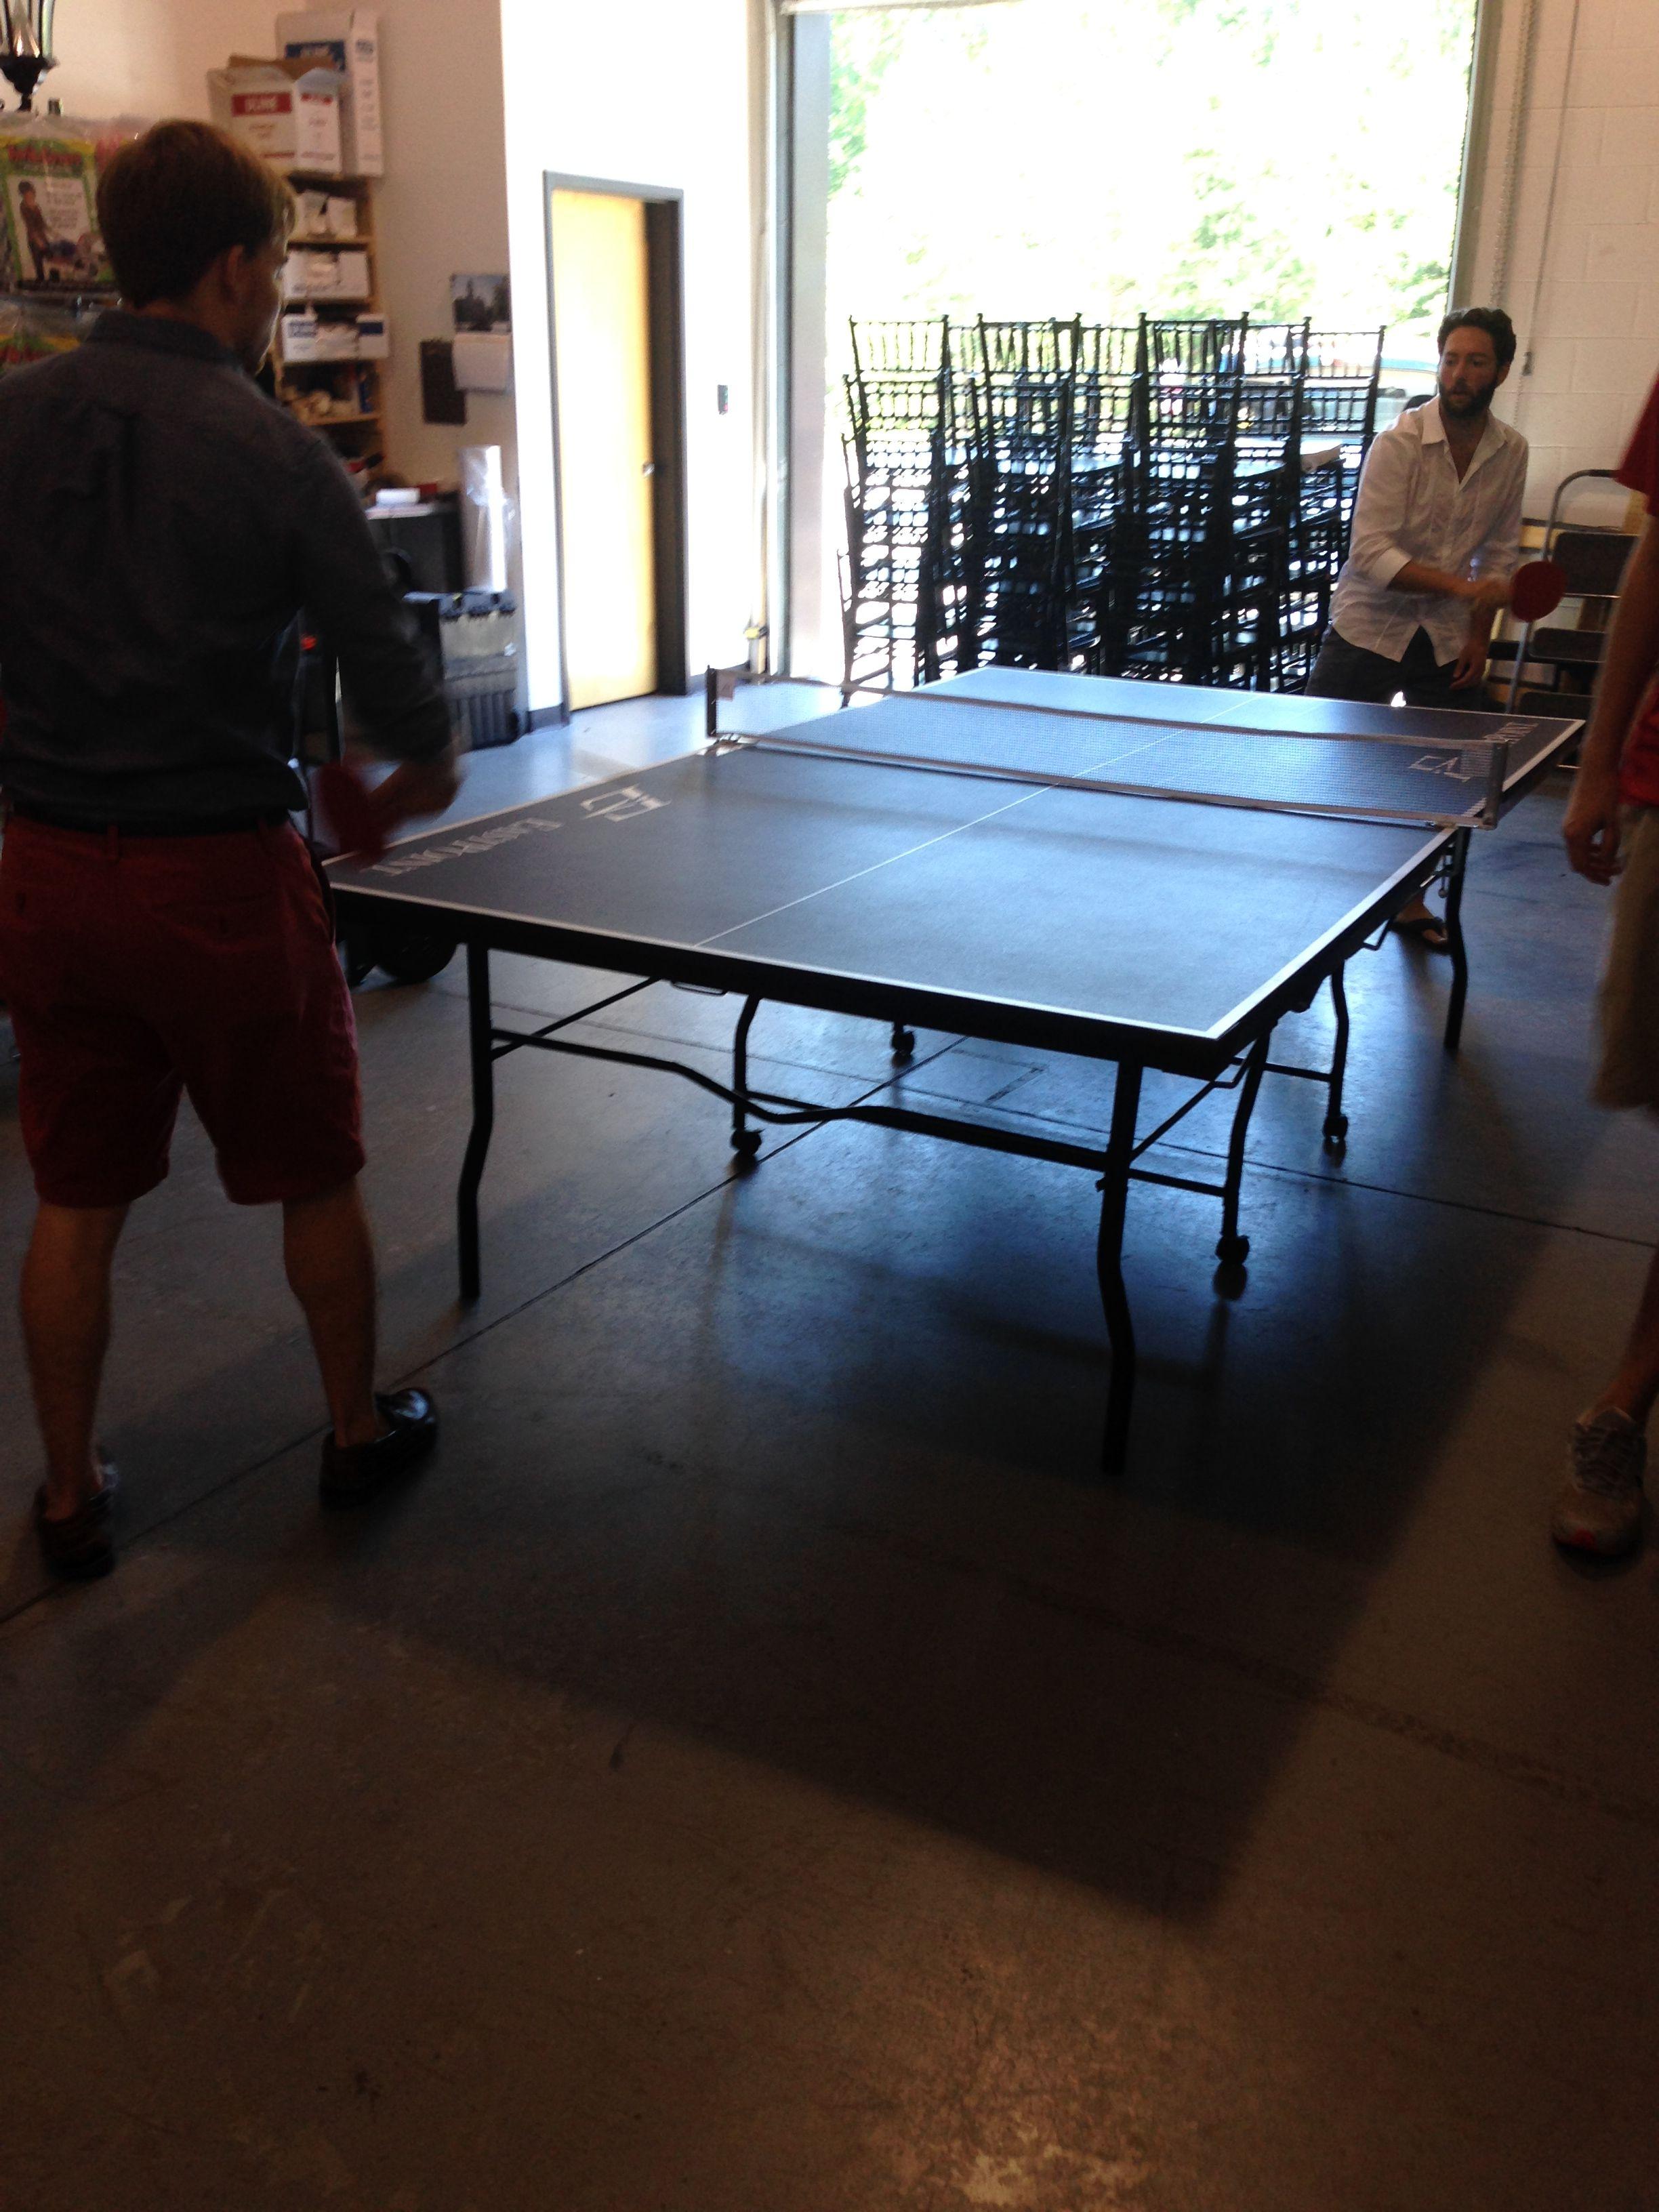 Bon #Atlanta #rental #ping #pong #table #tabletennis